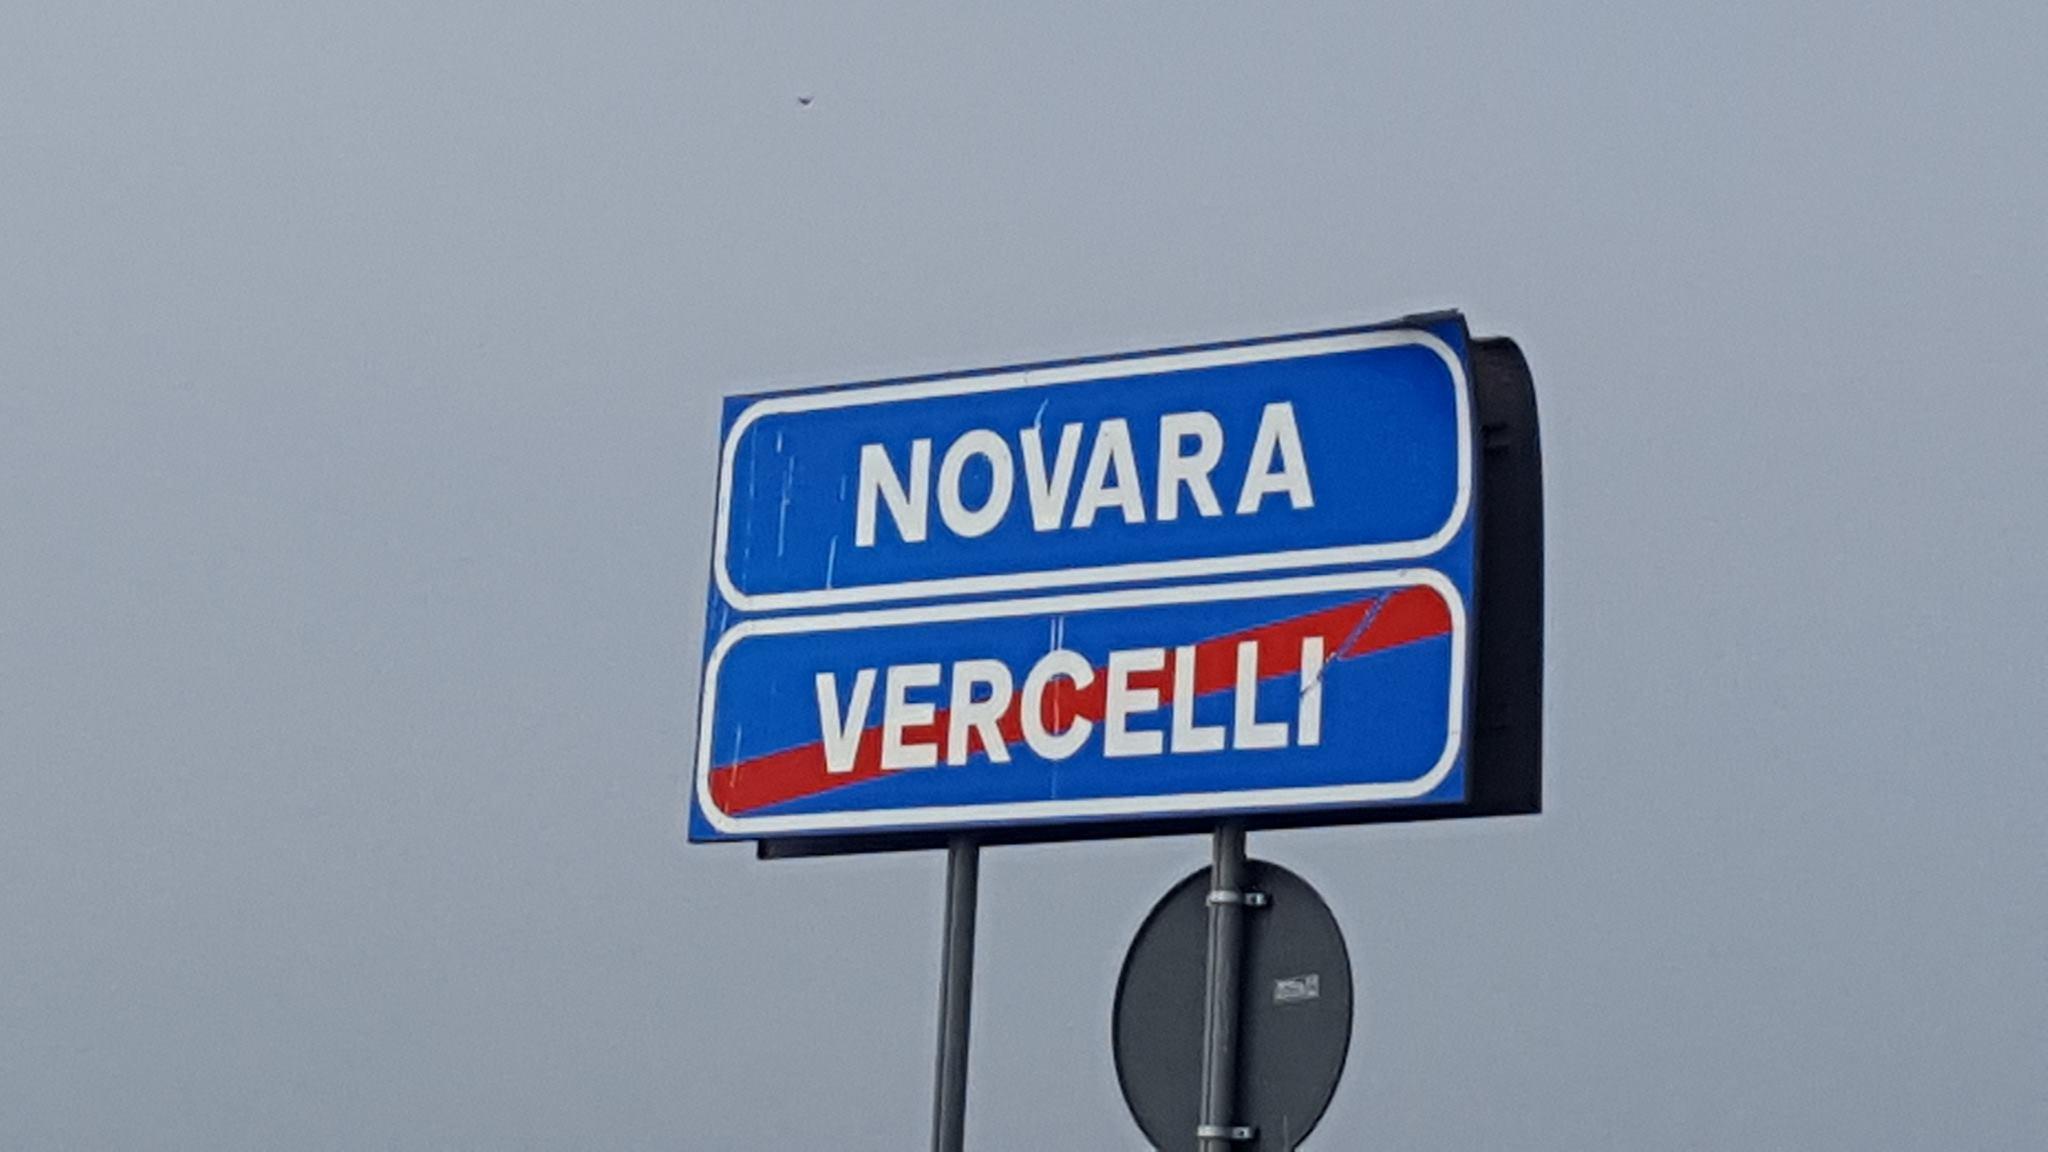 La Novara che festeggia